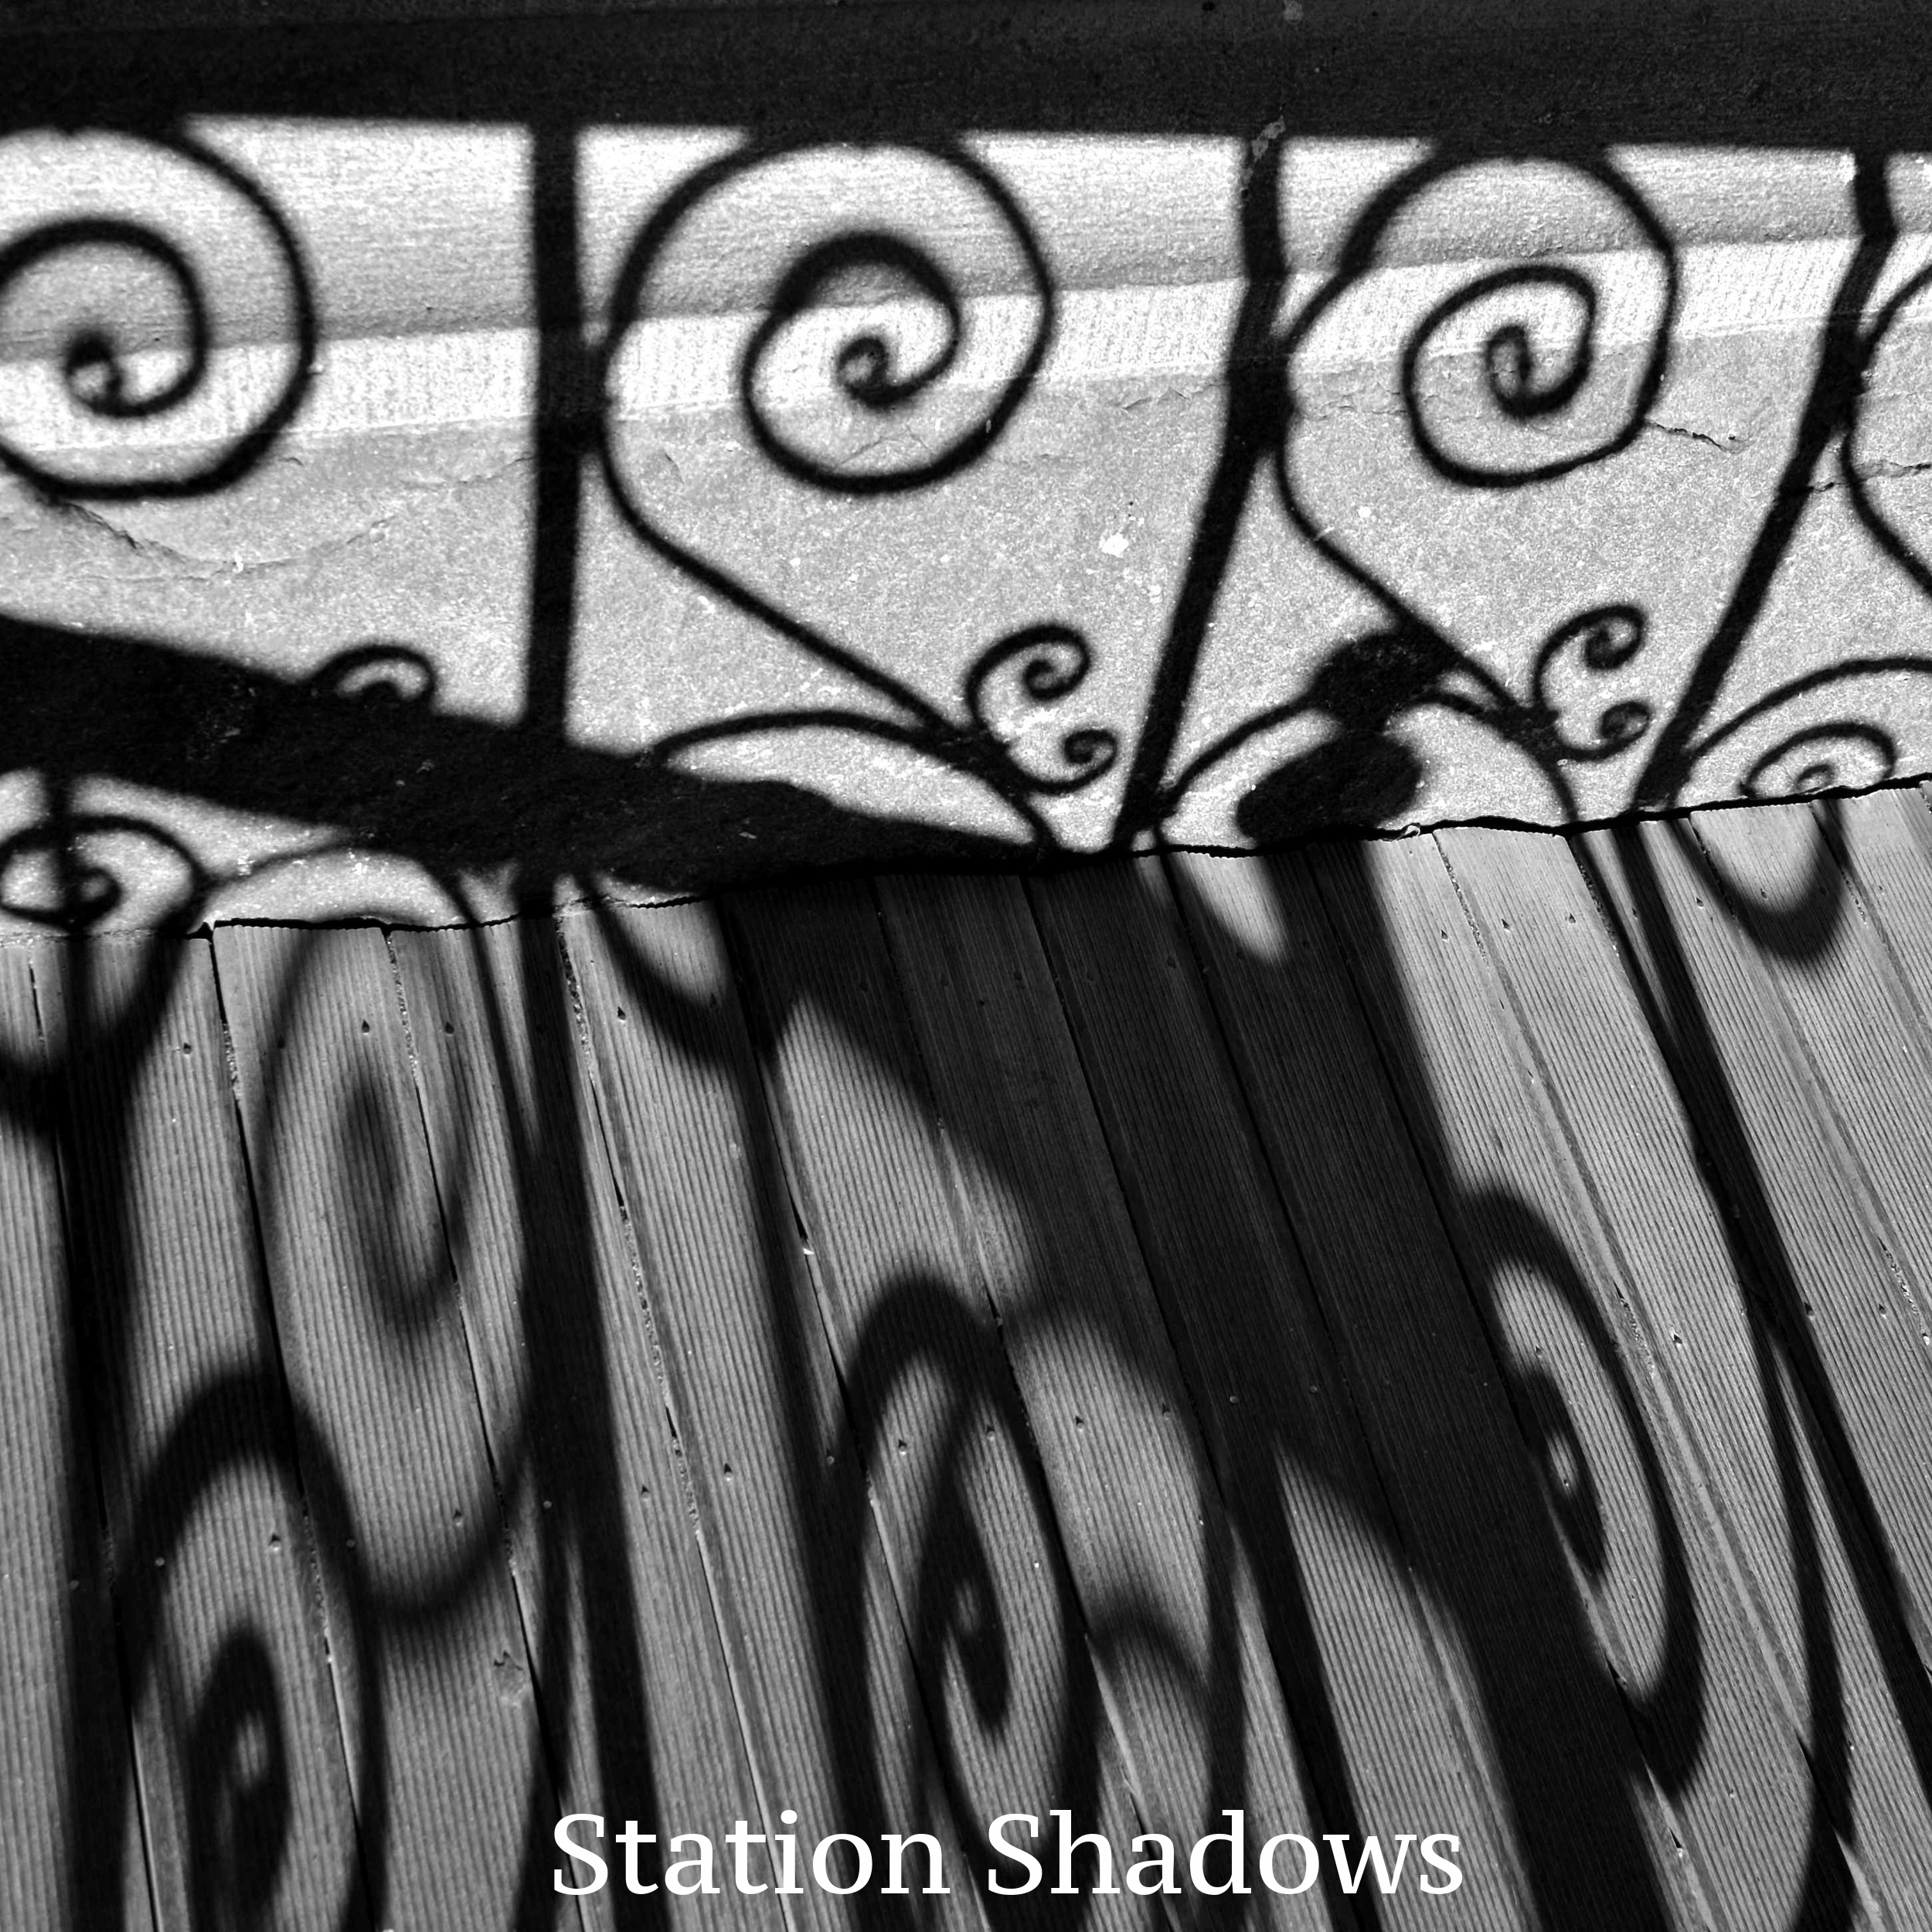 Station shadows